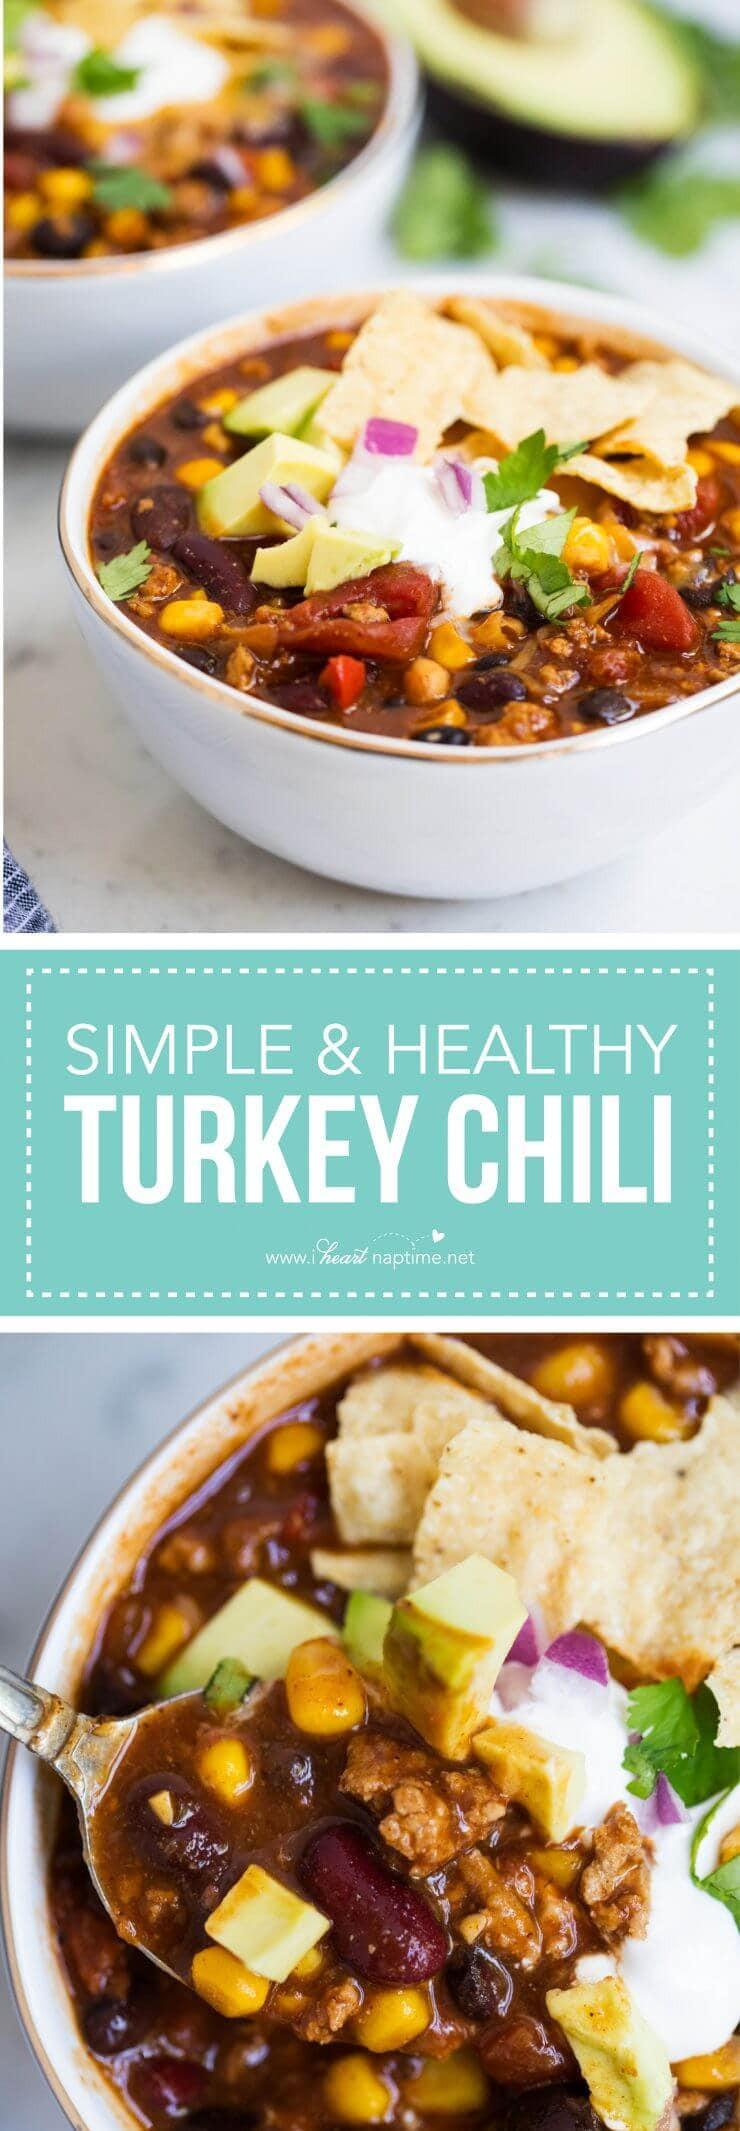 Simple Turkey Chili  real simple turkey chili recipe